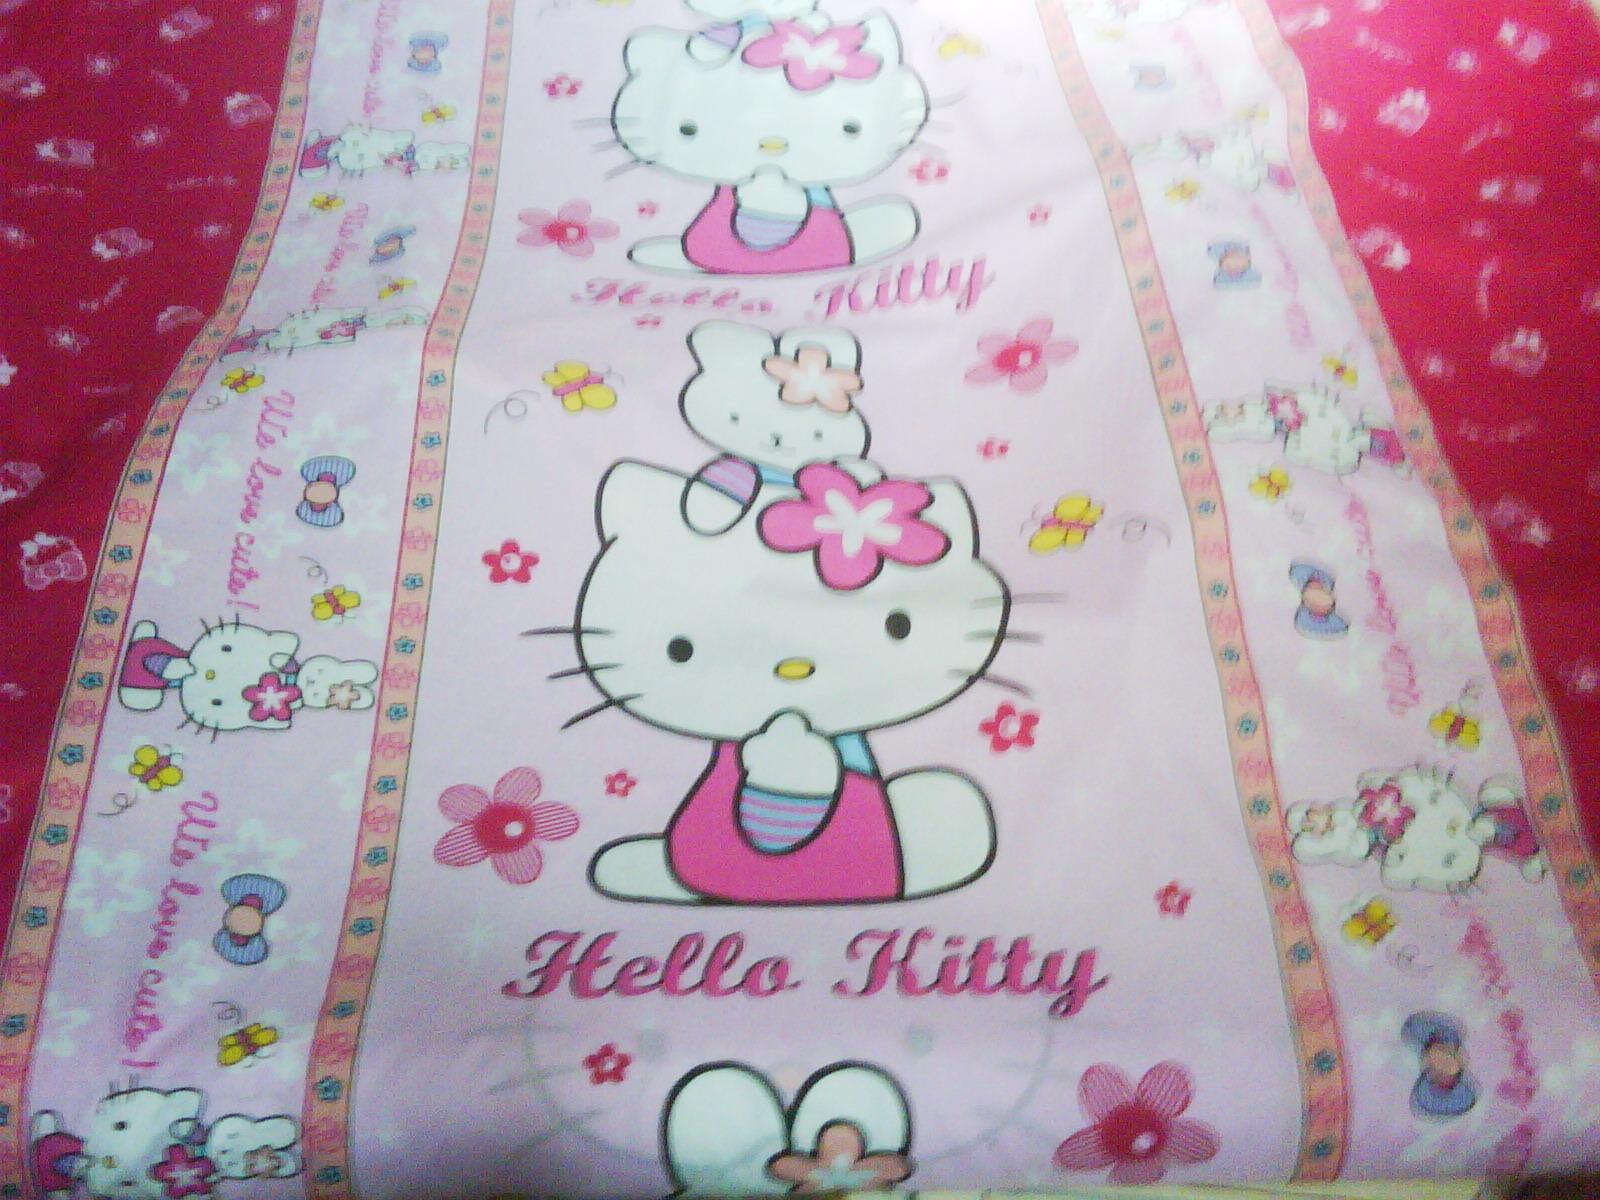 Sprei Hello Kitty Katun Jepang Murah Distributor September 2011 Gorden Karakter Dan